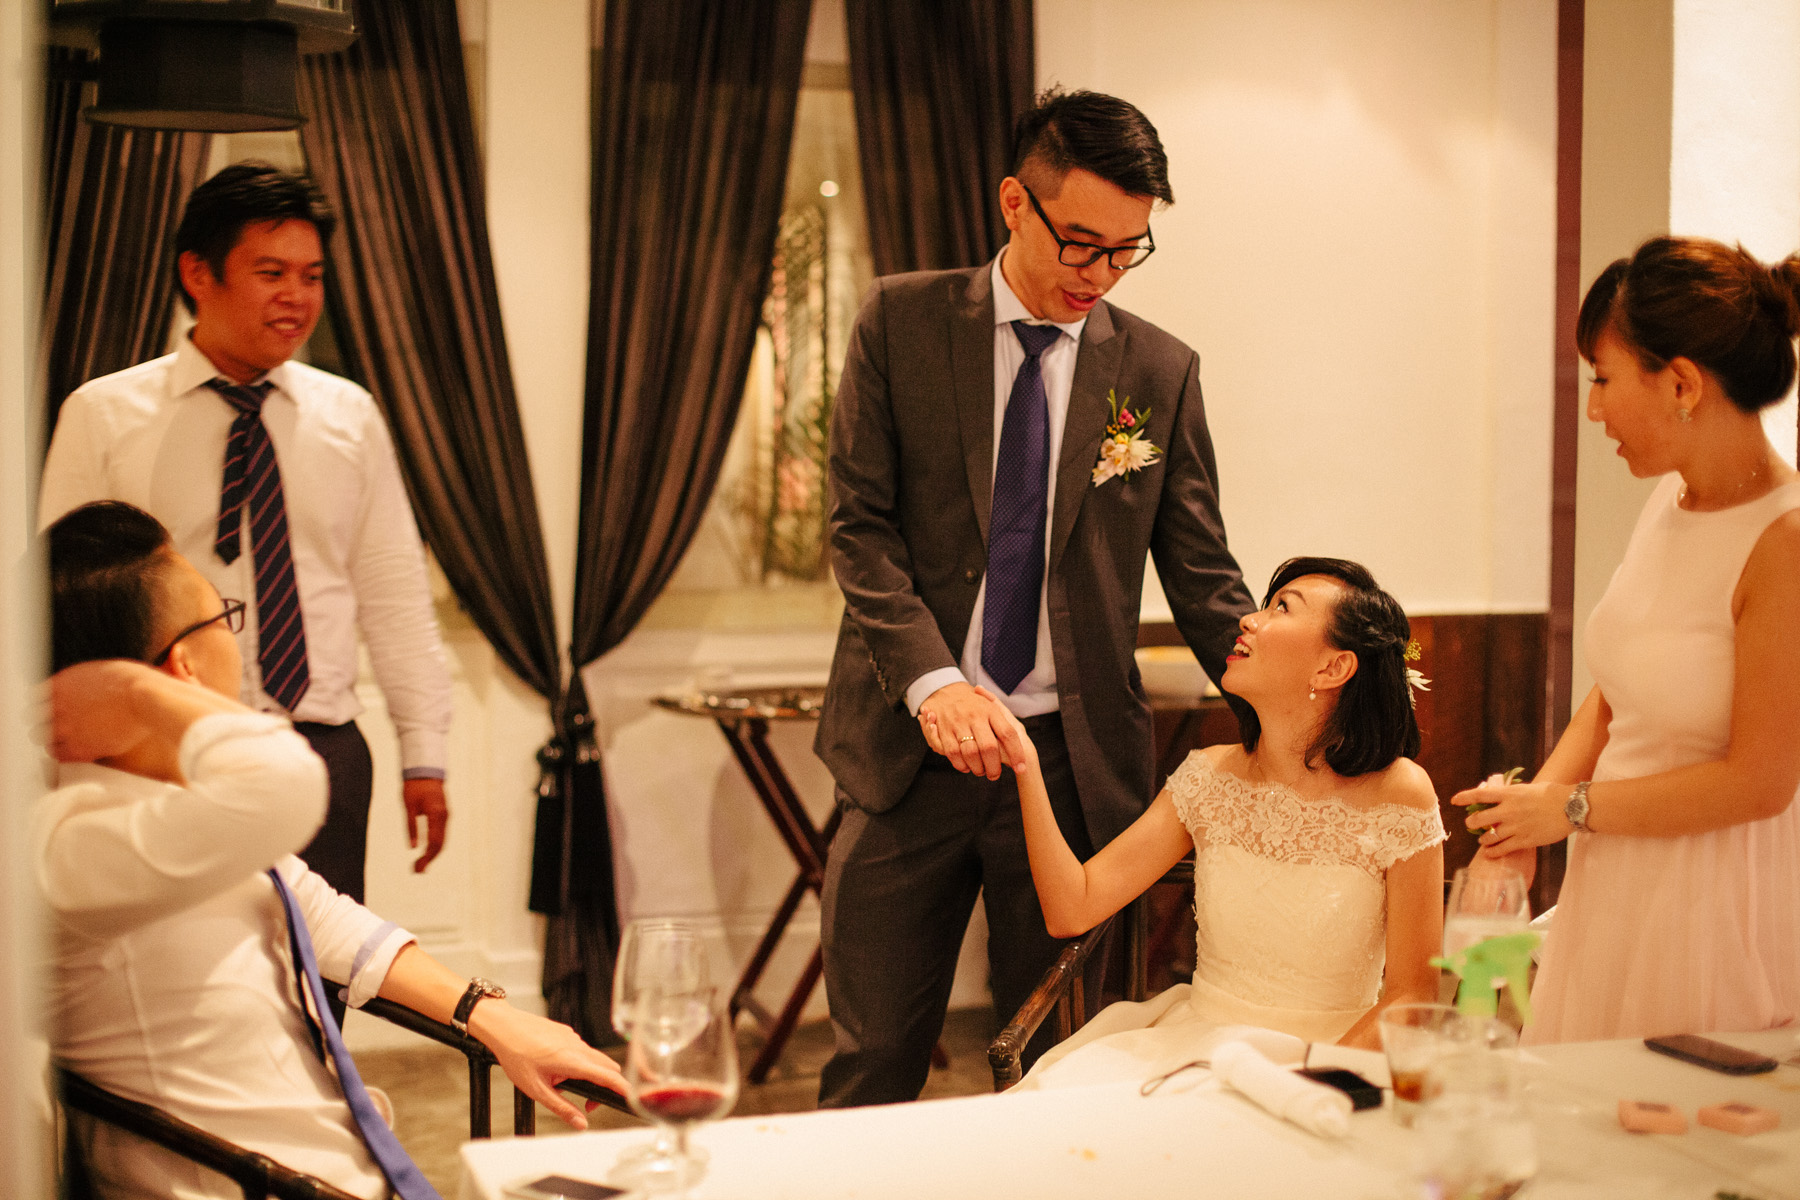 singapore-wedding-travel-photographer-faith-alvin-wedding-wmt-54.jpg